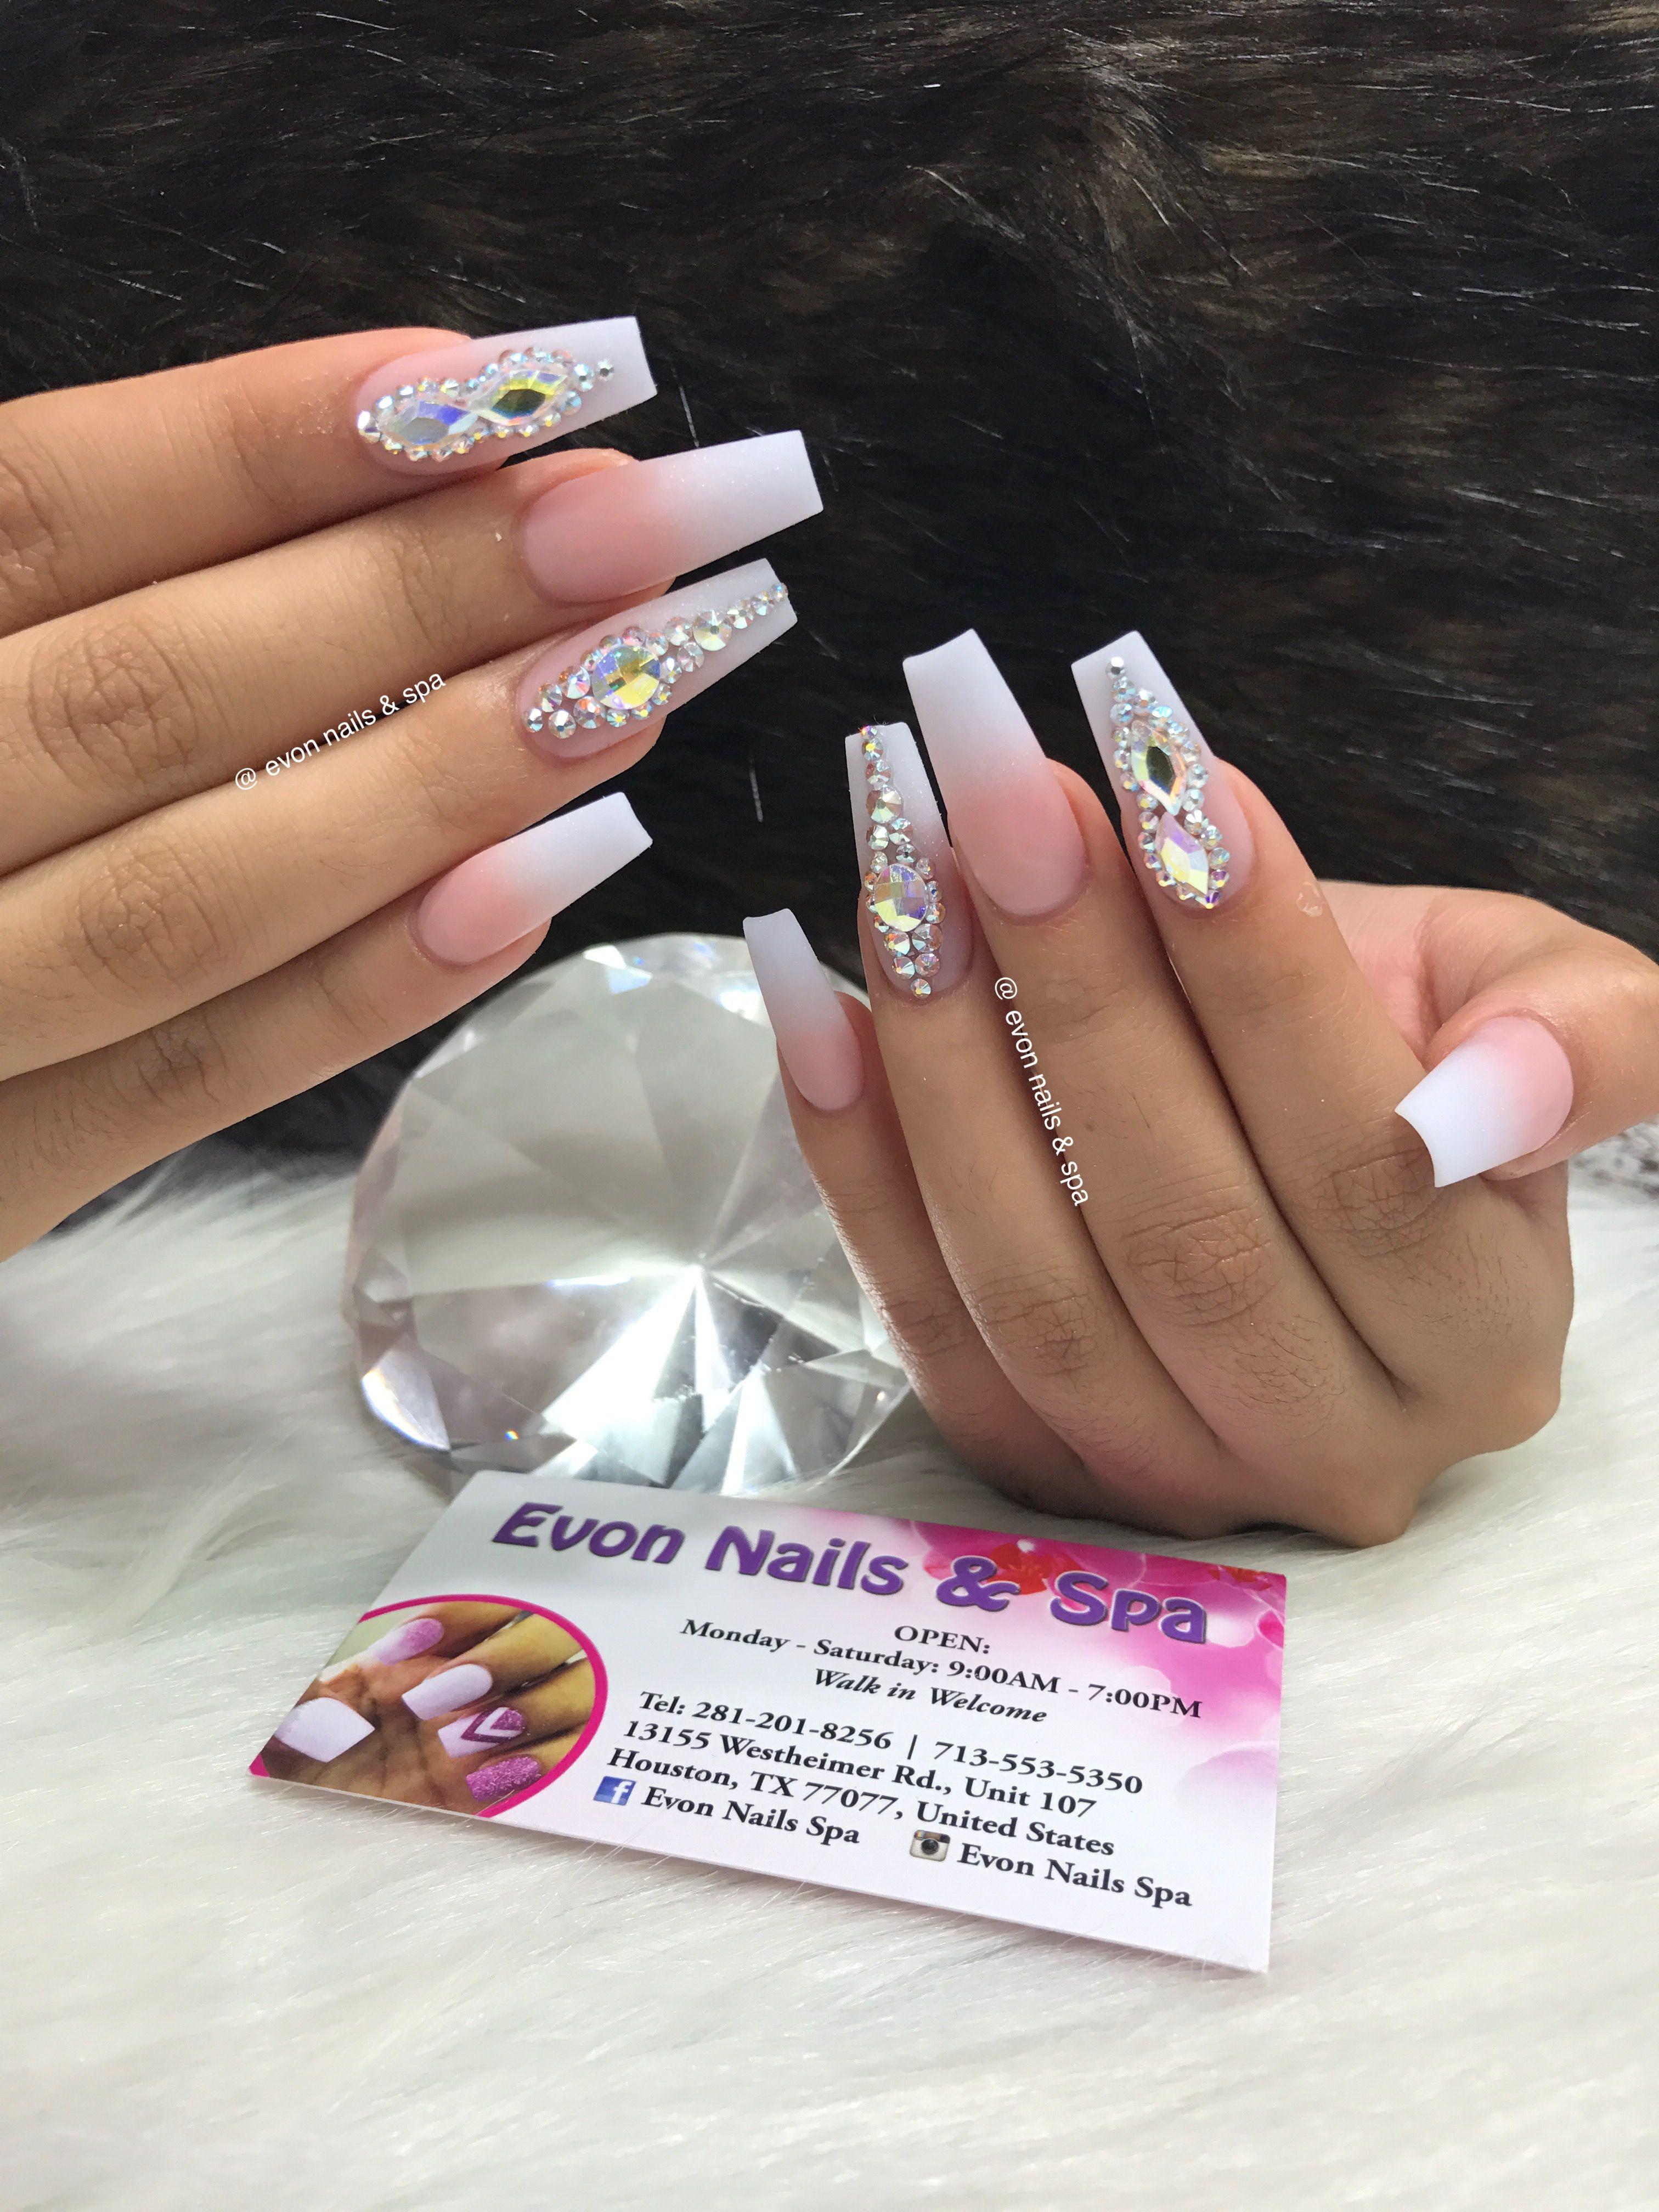 Pin On Evon Nails Spa Instagram Evon Nails Spa Facebook Evon Nails